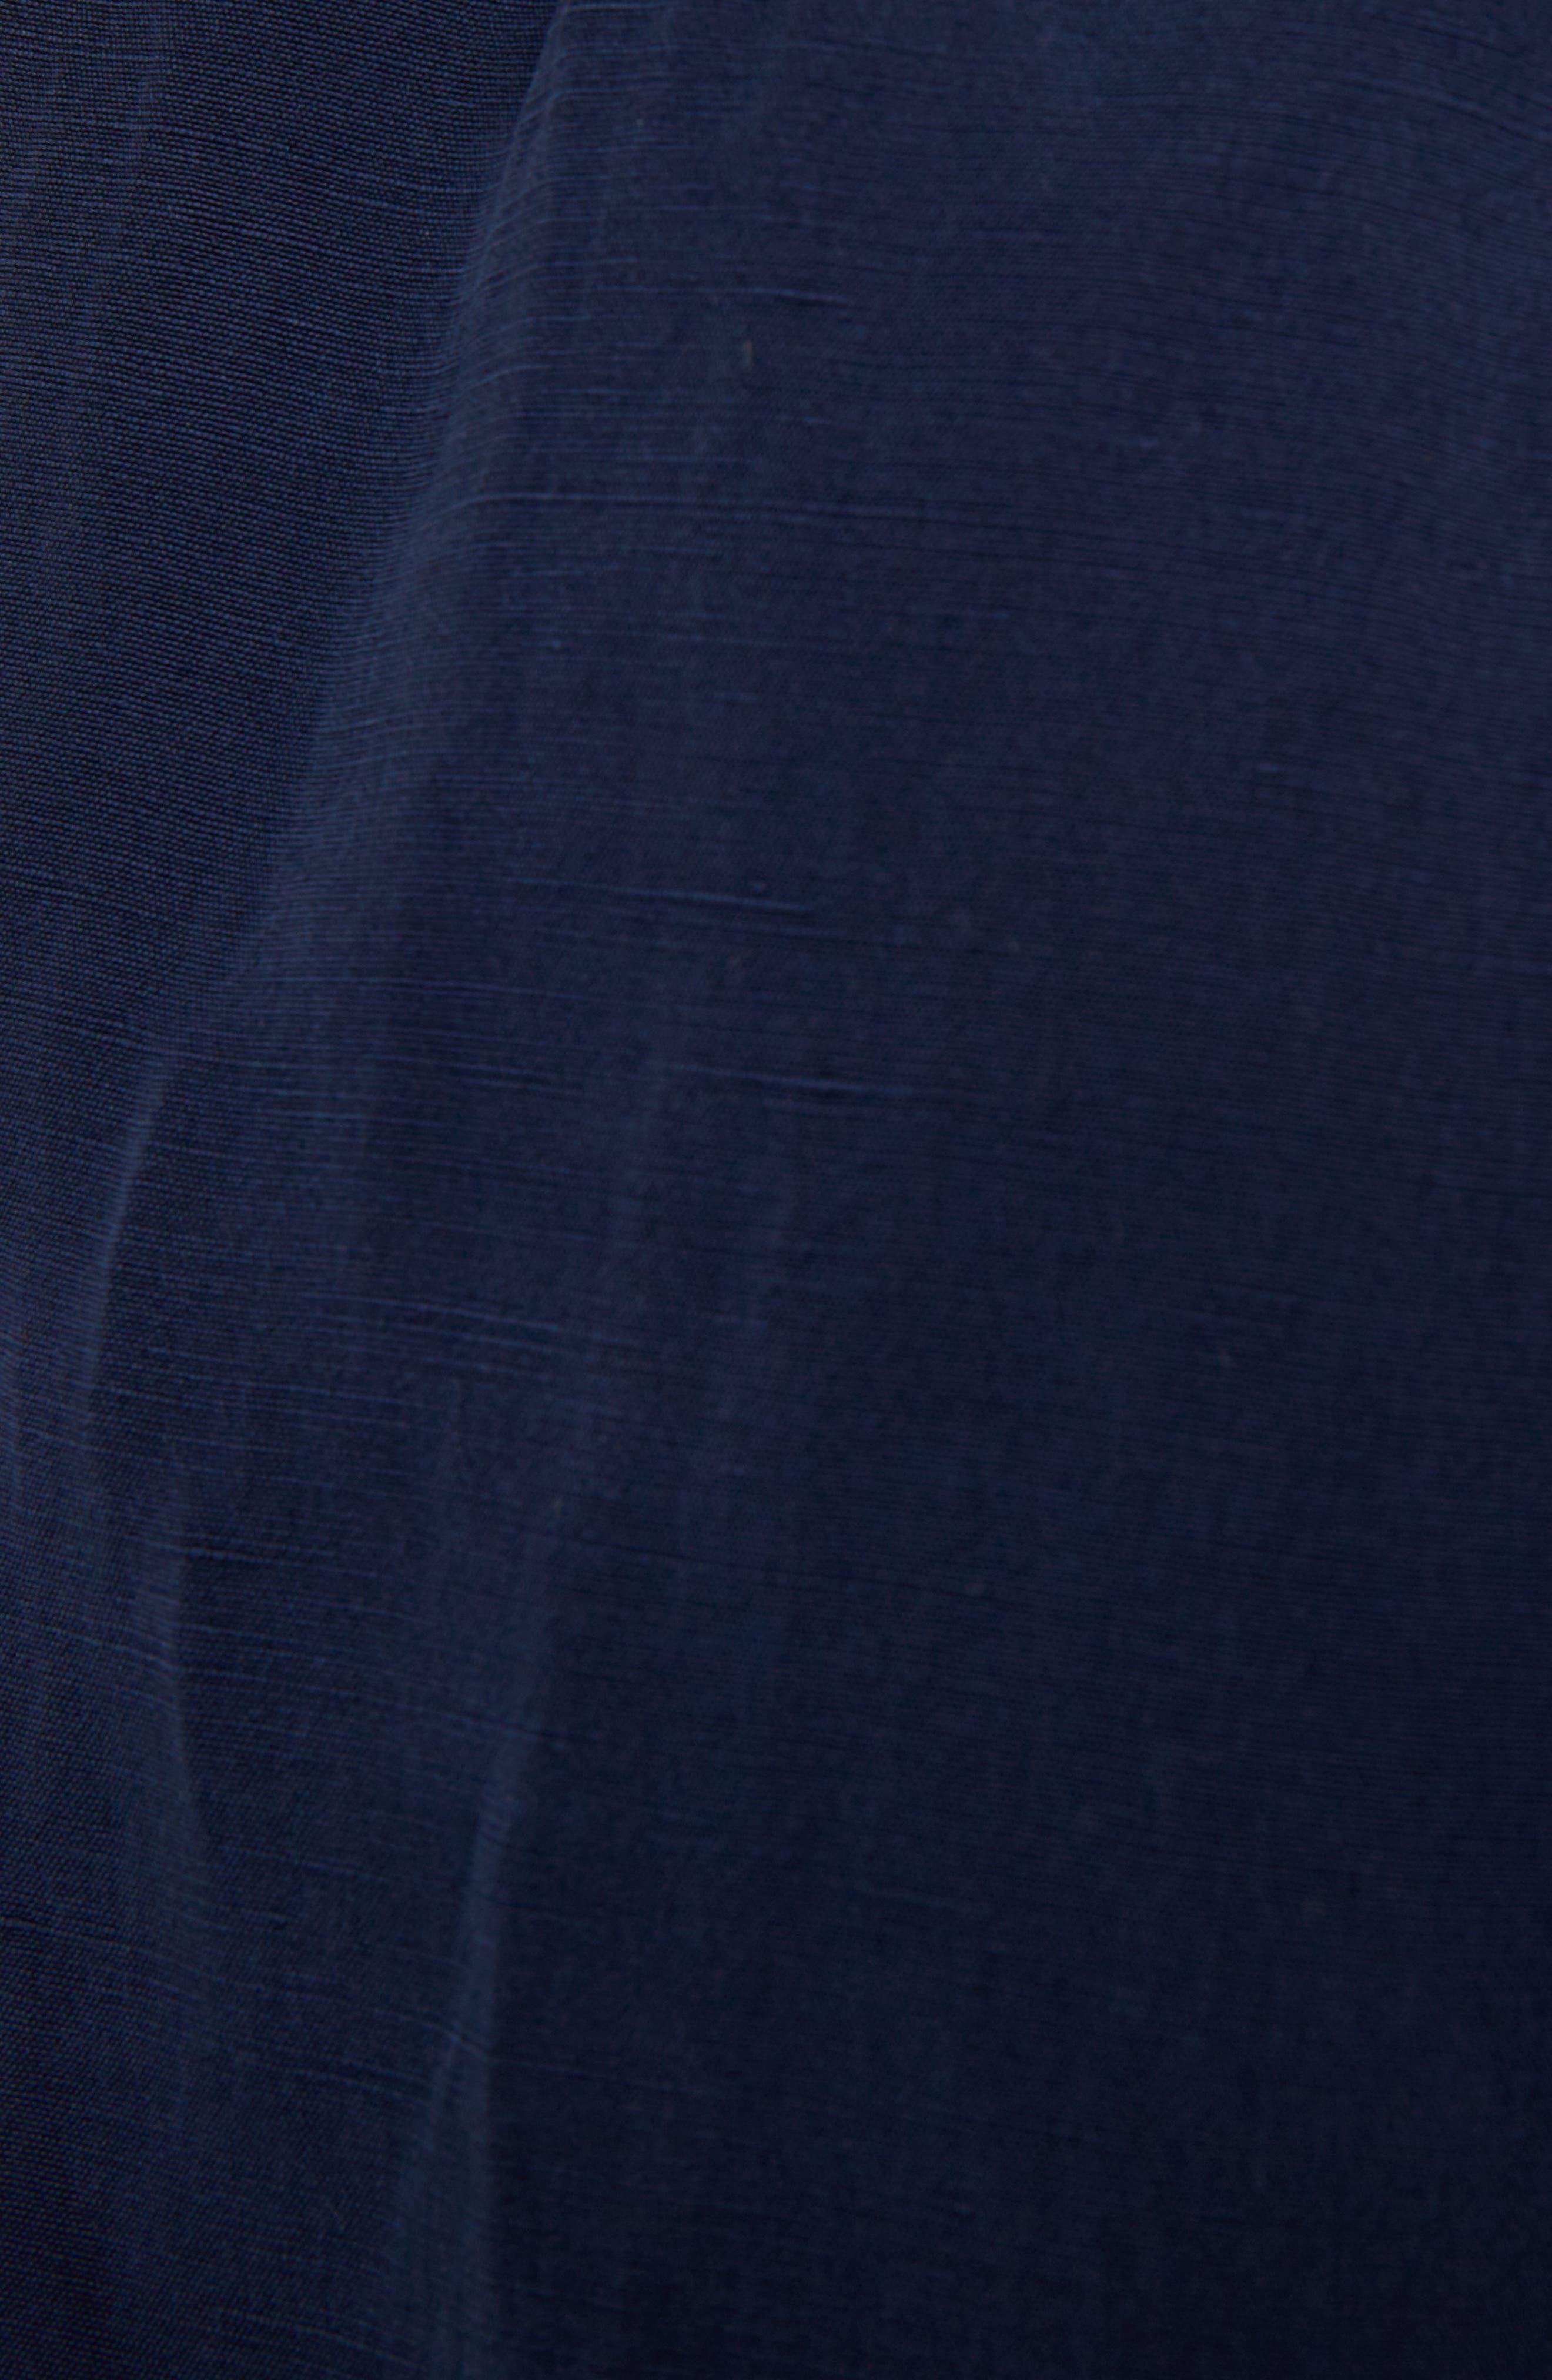 Leather Pocket Linen & Silk Boxer Shorts,                             Alternate thumbnail 5, color,                             400